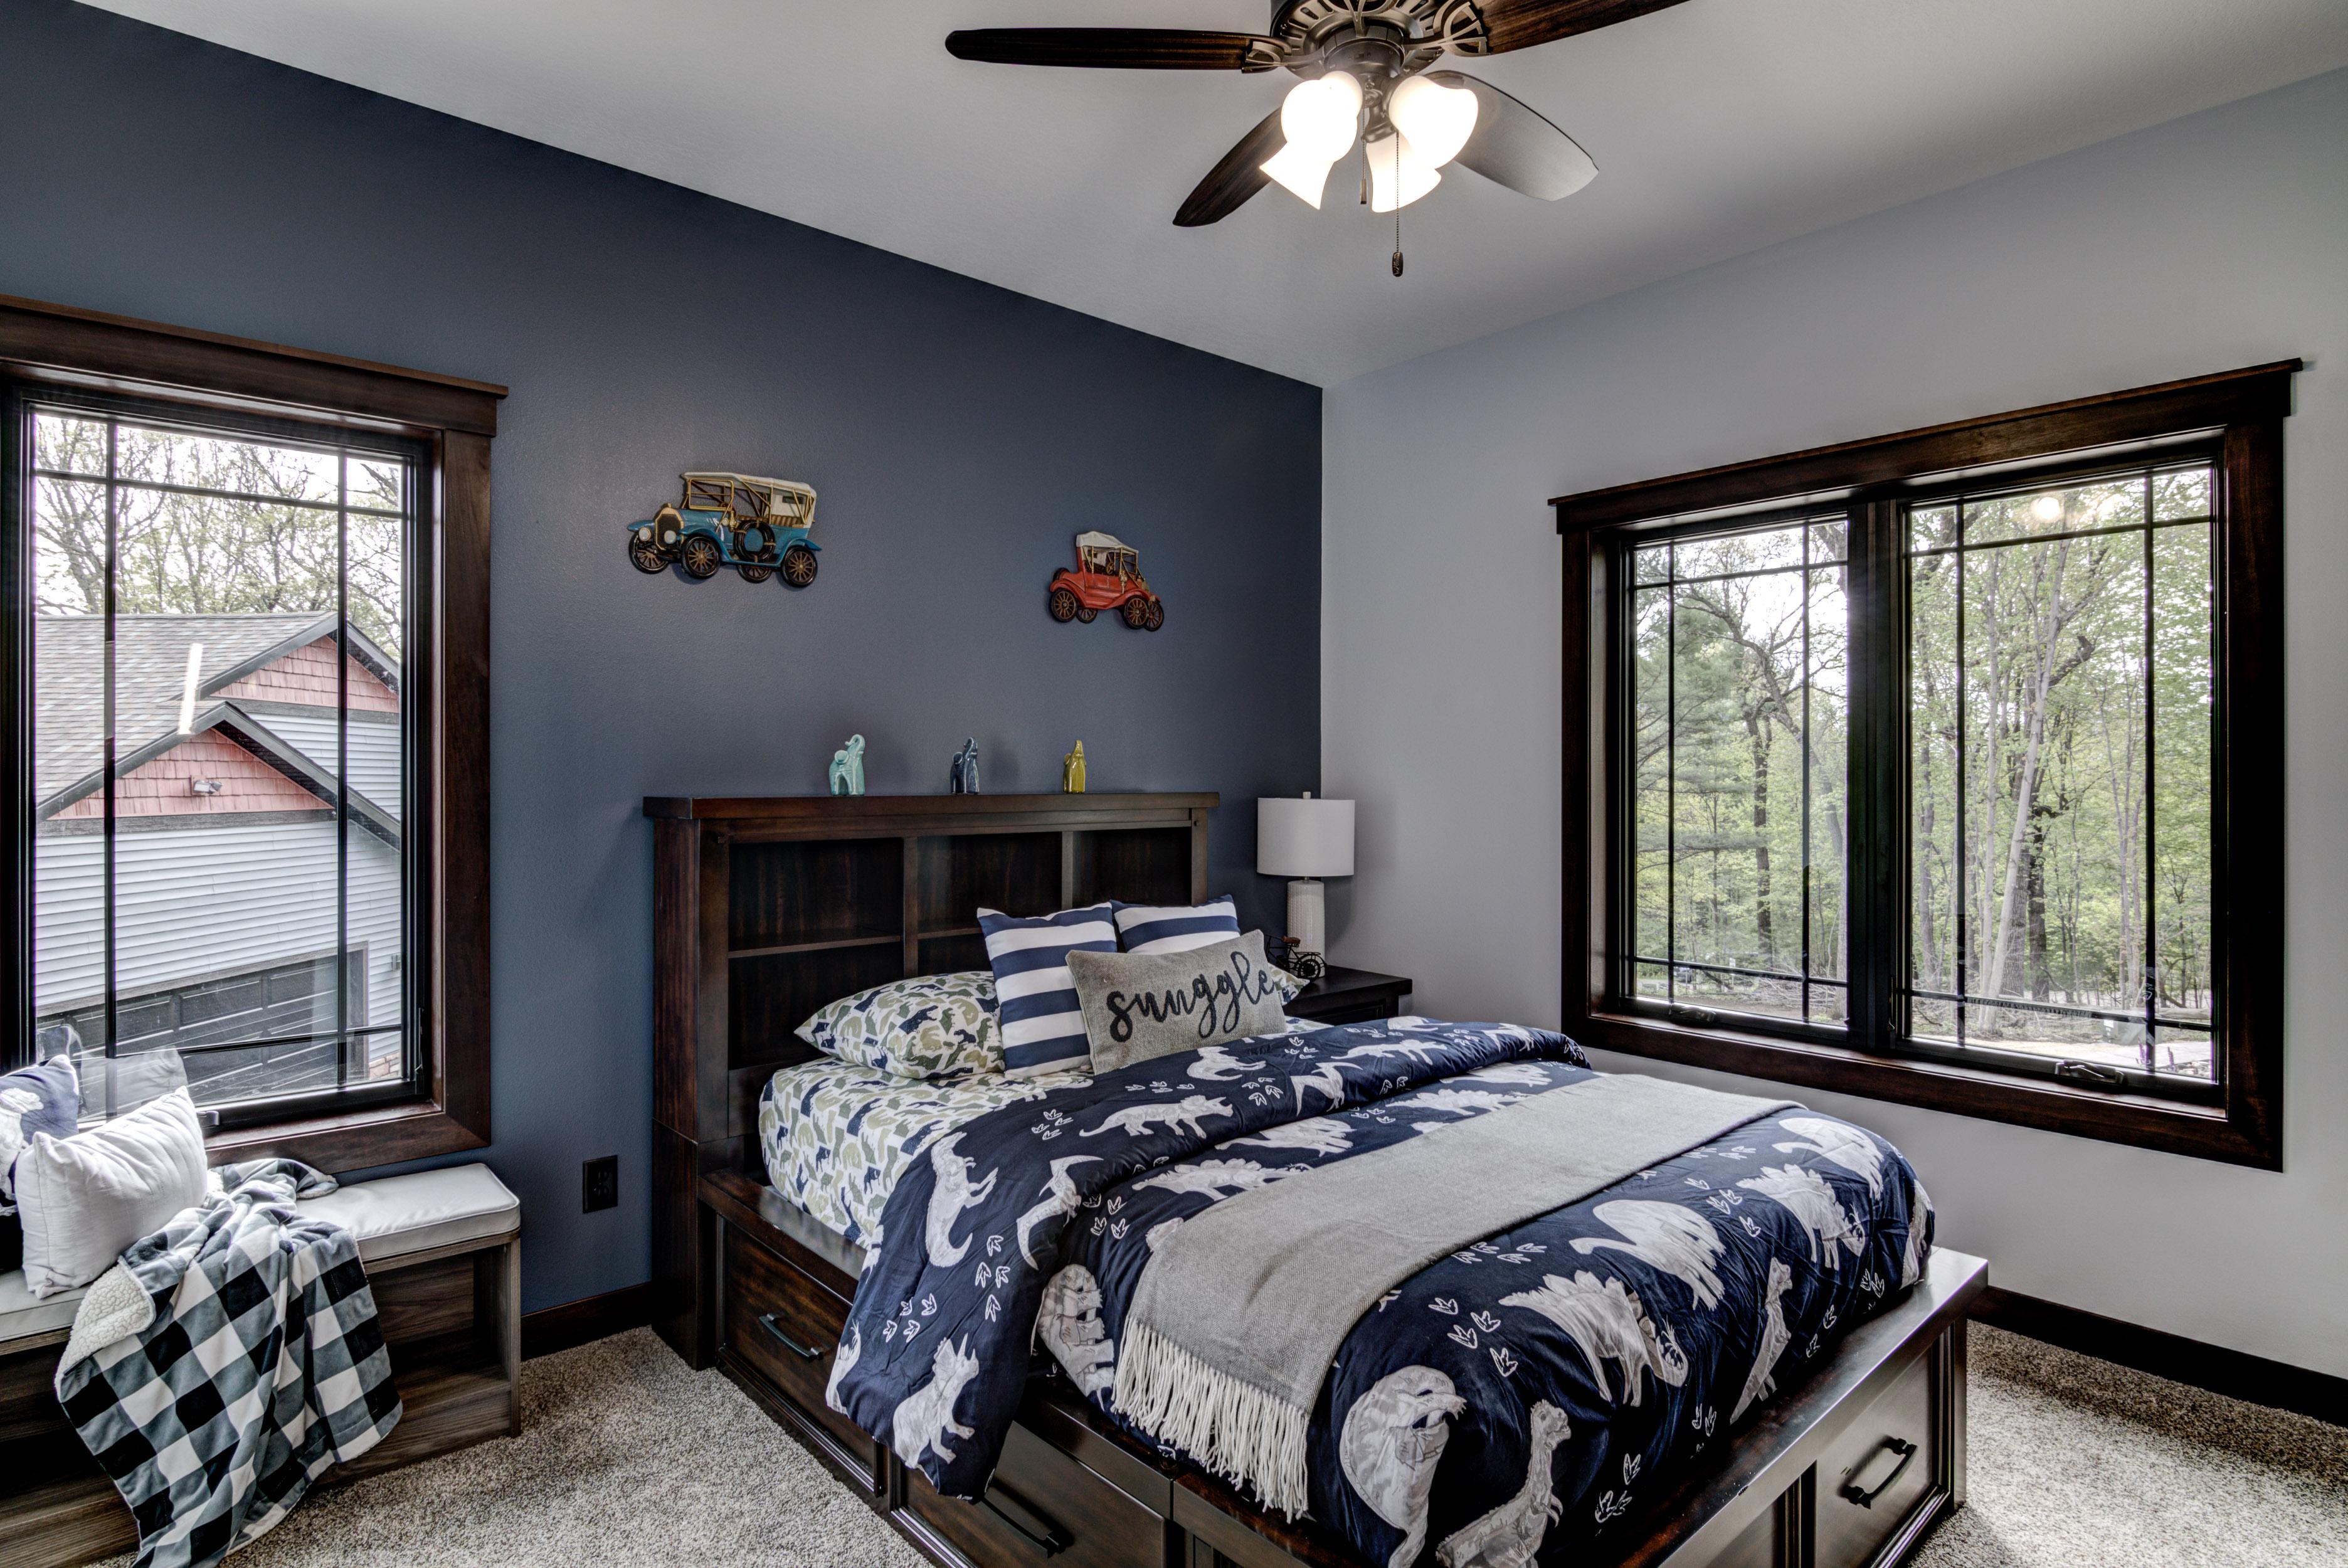 32-10 - Main Level Bedroom - 1-1